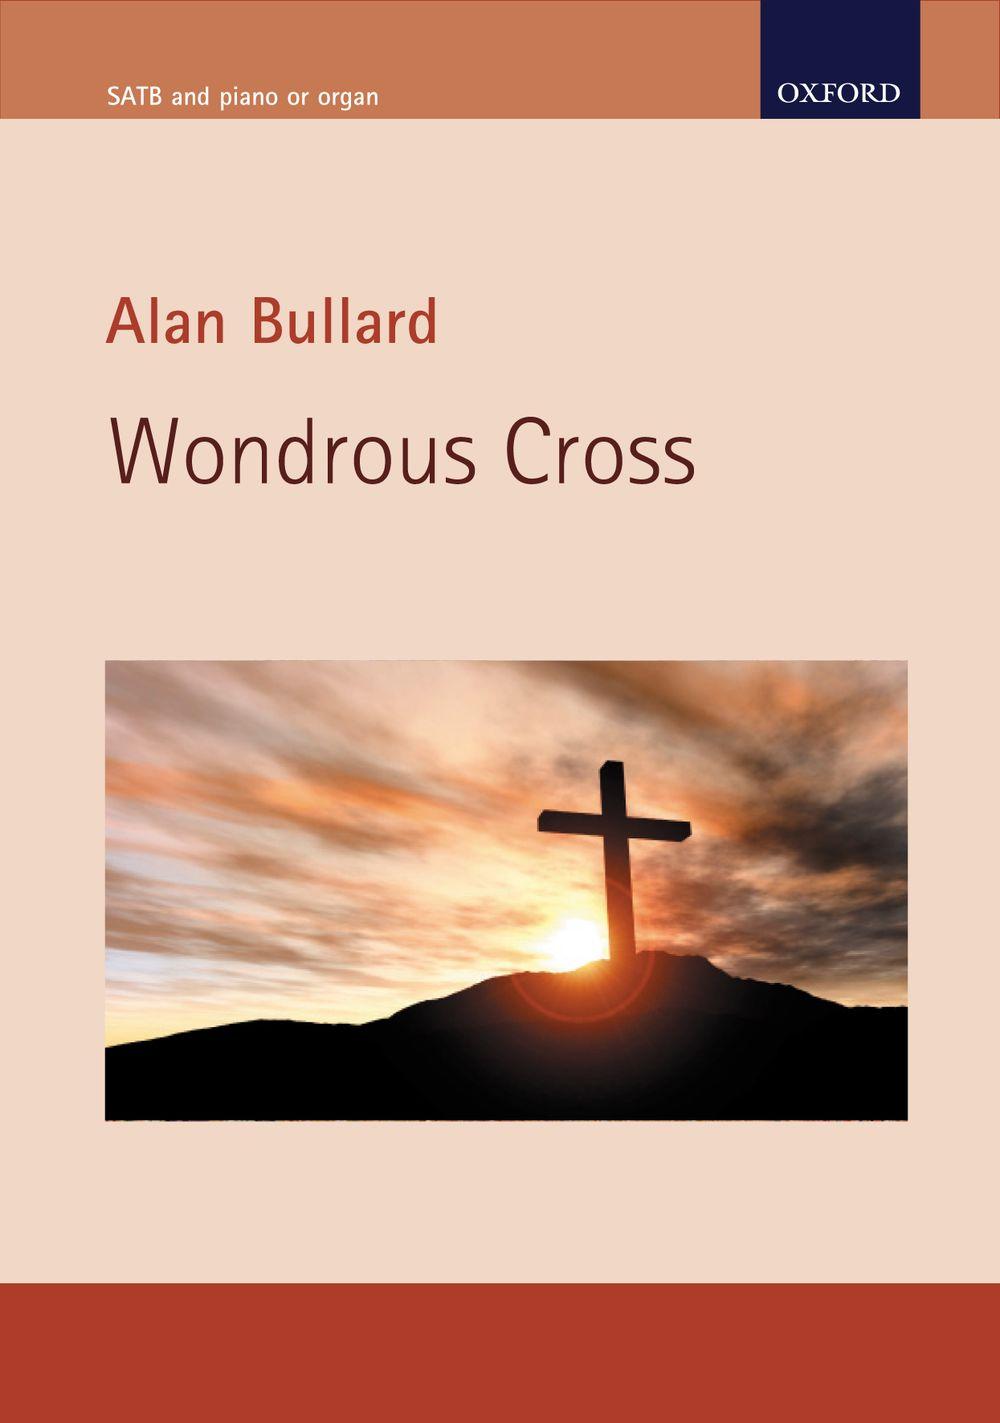 Alan Bullard: Wondrous Cross: SATB: Vocal Score